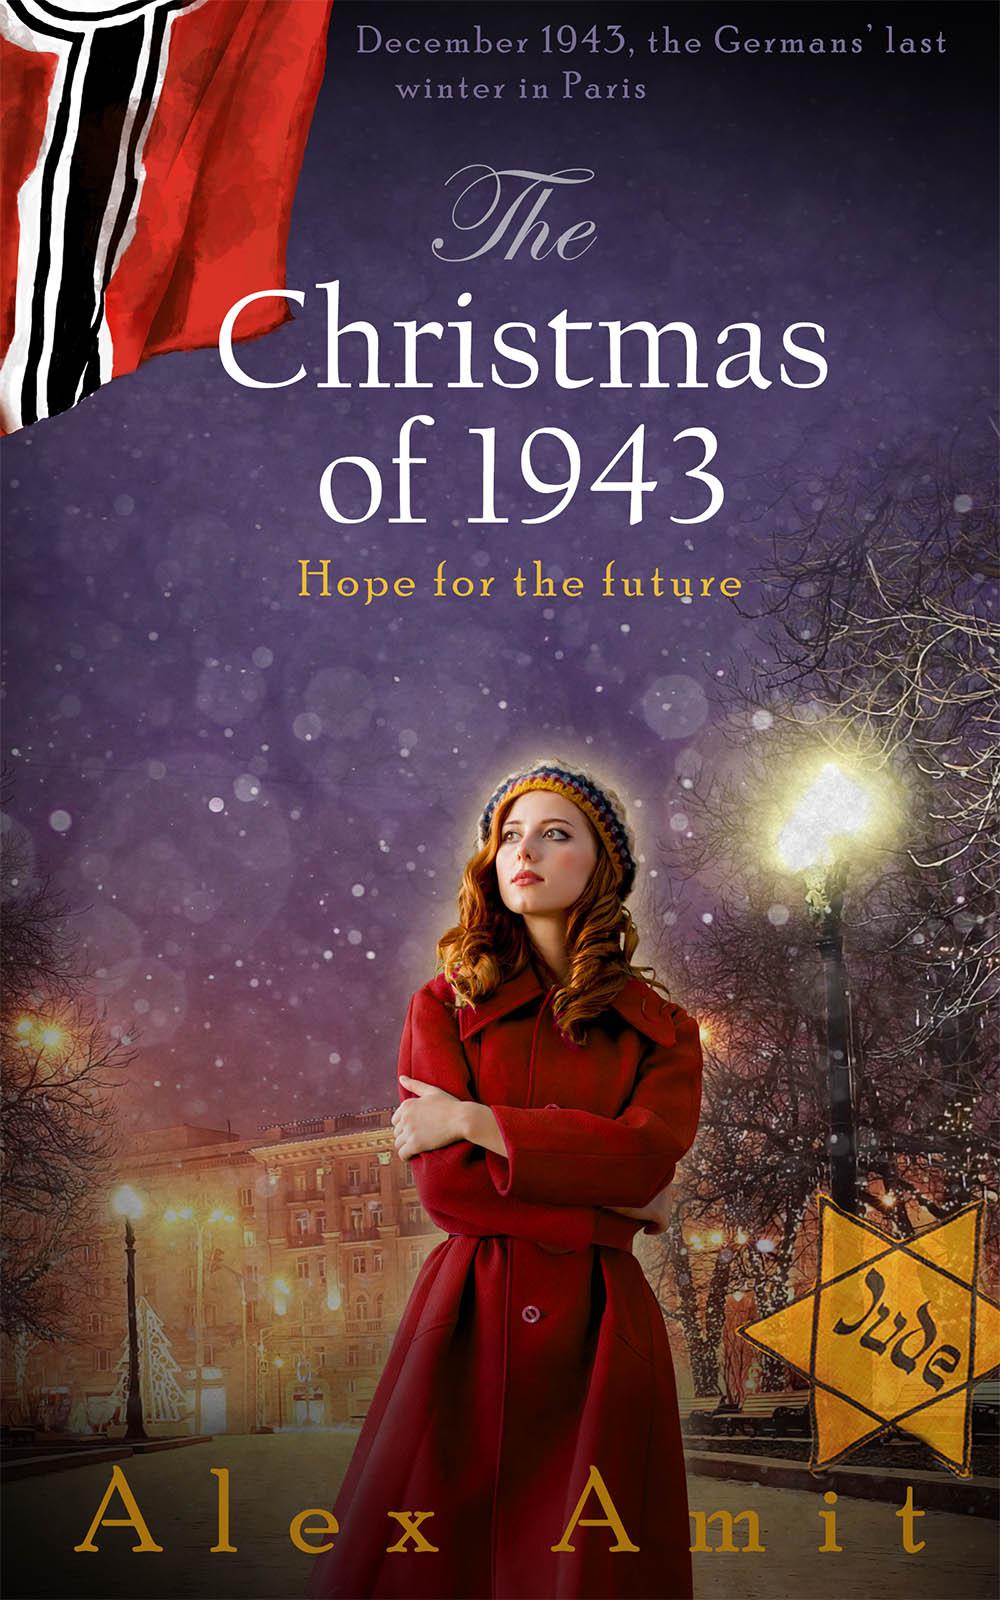 The Christmas of 1943